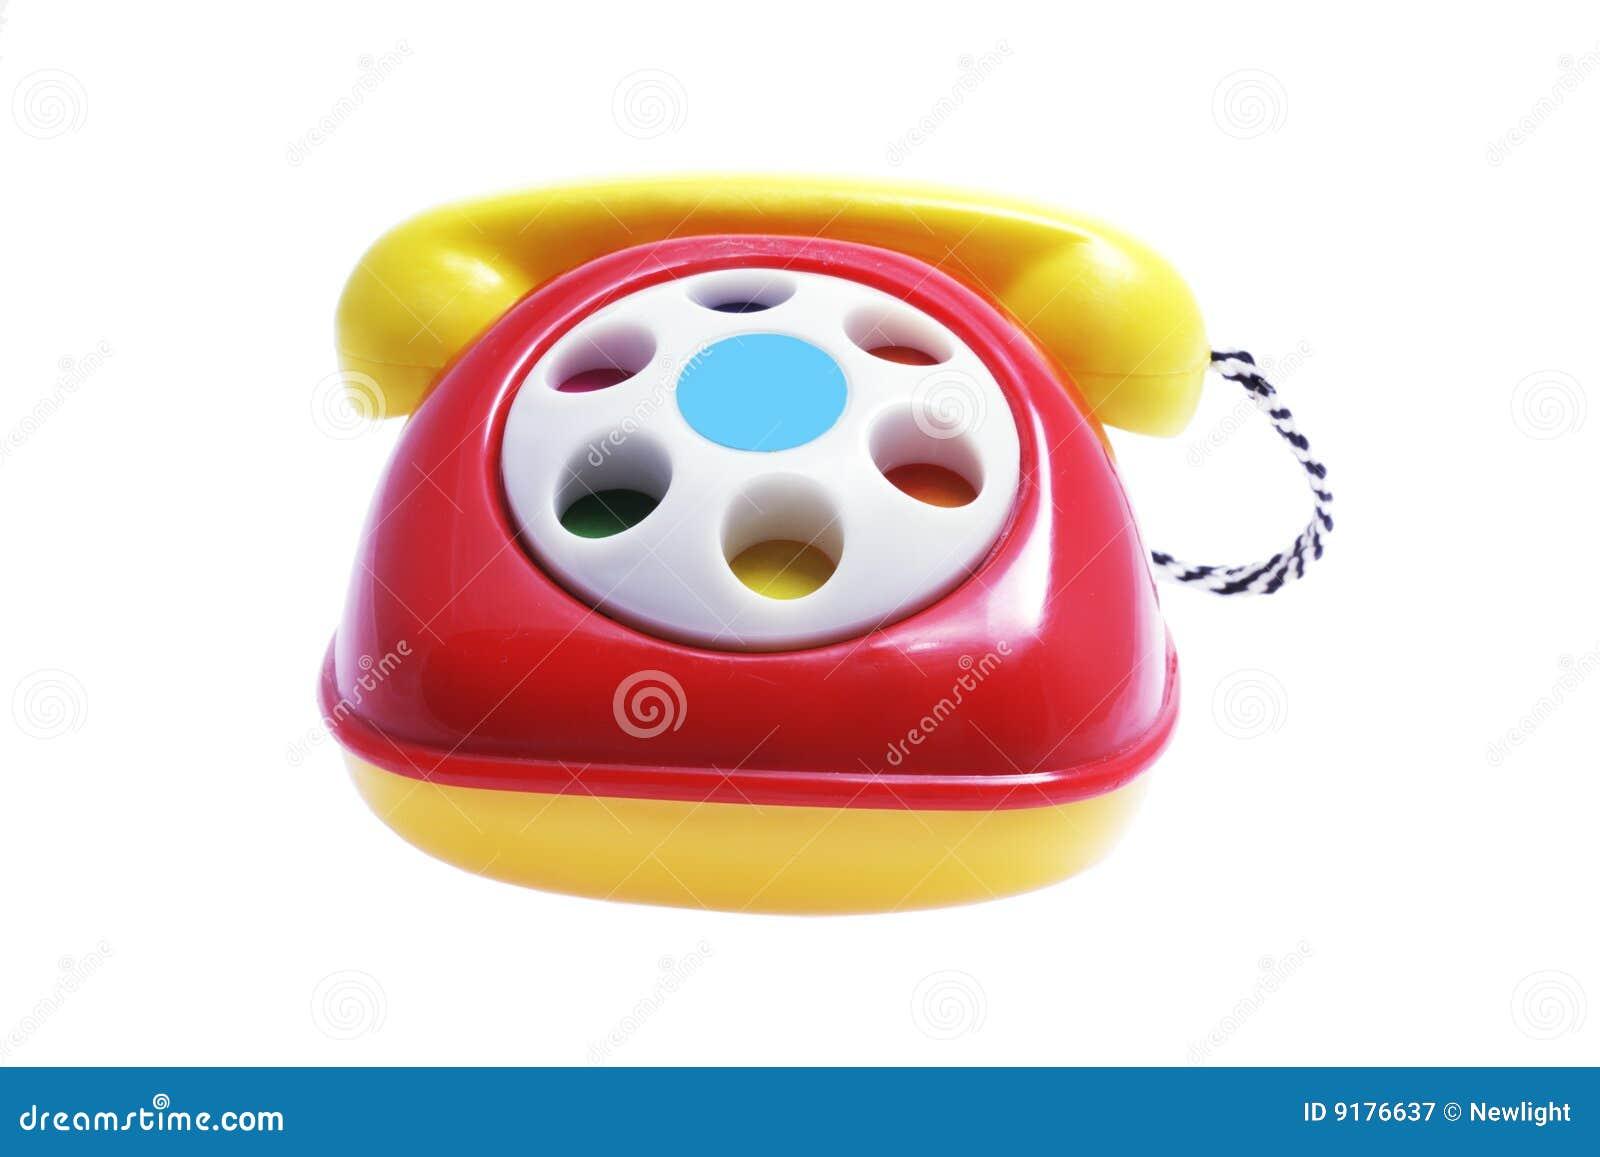 Spielzeug telefon stockbild bild von leben